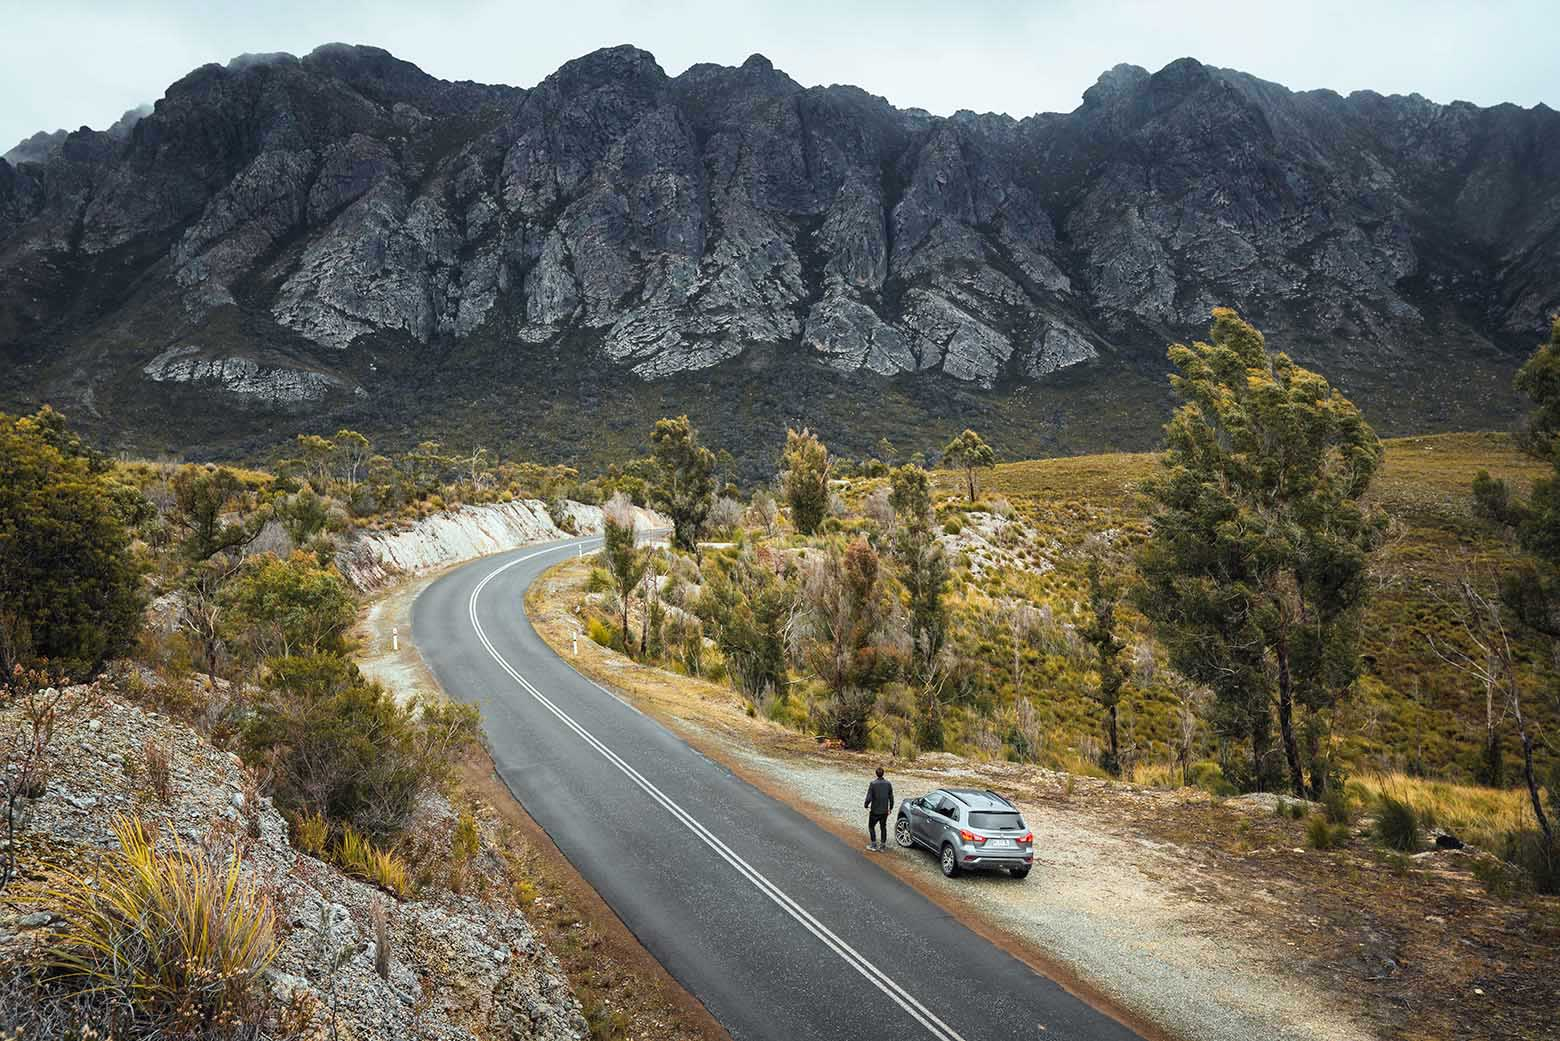 Road to the Sentinel Range - Tasmania itinerary (7 days)